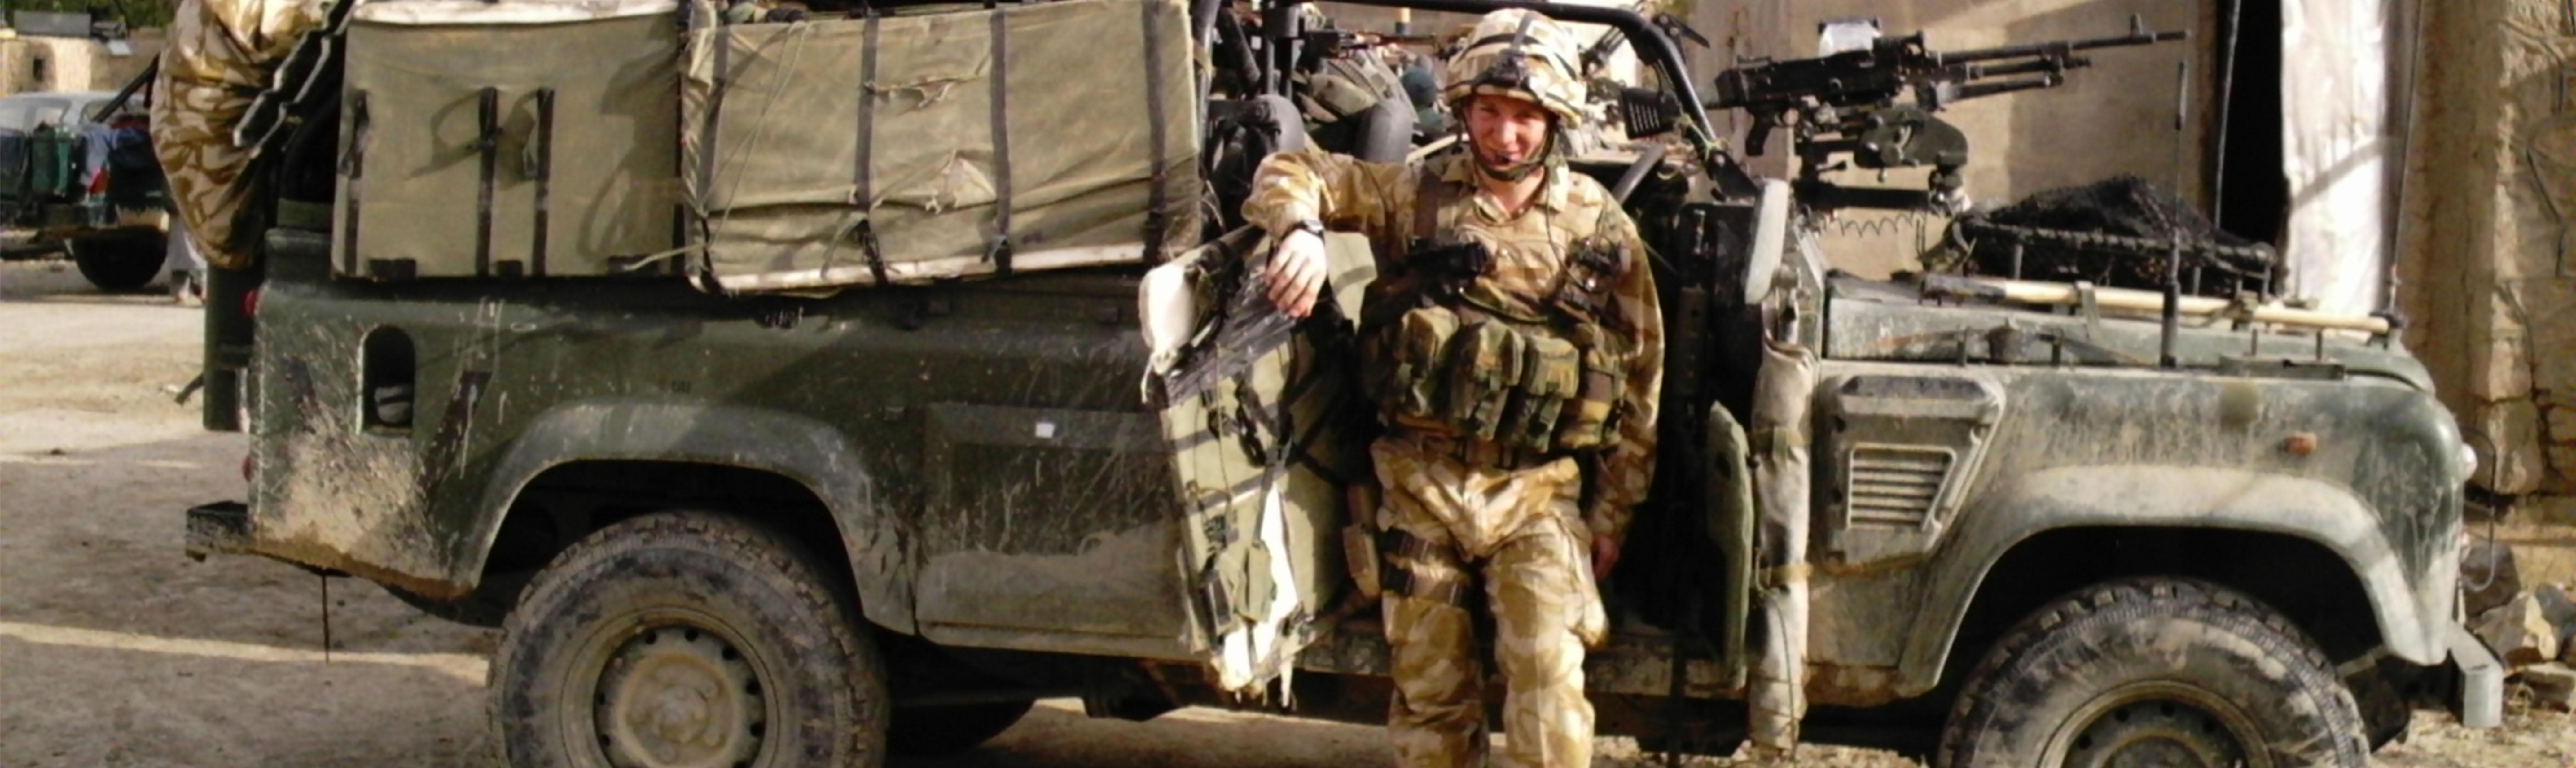 Tom Wilde - Military Scholarships